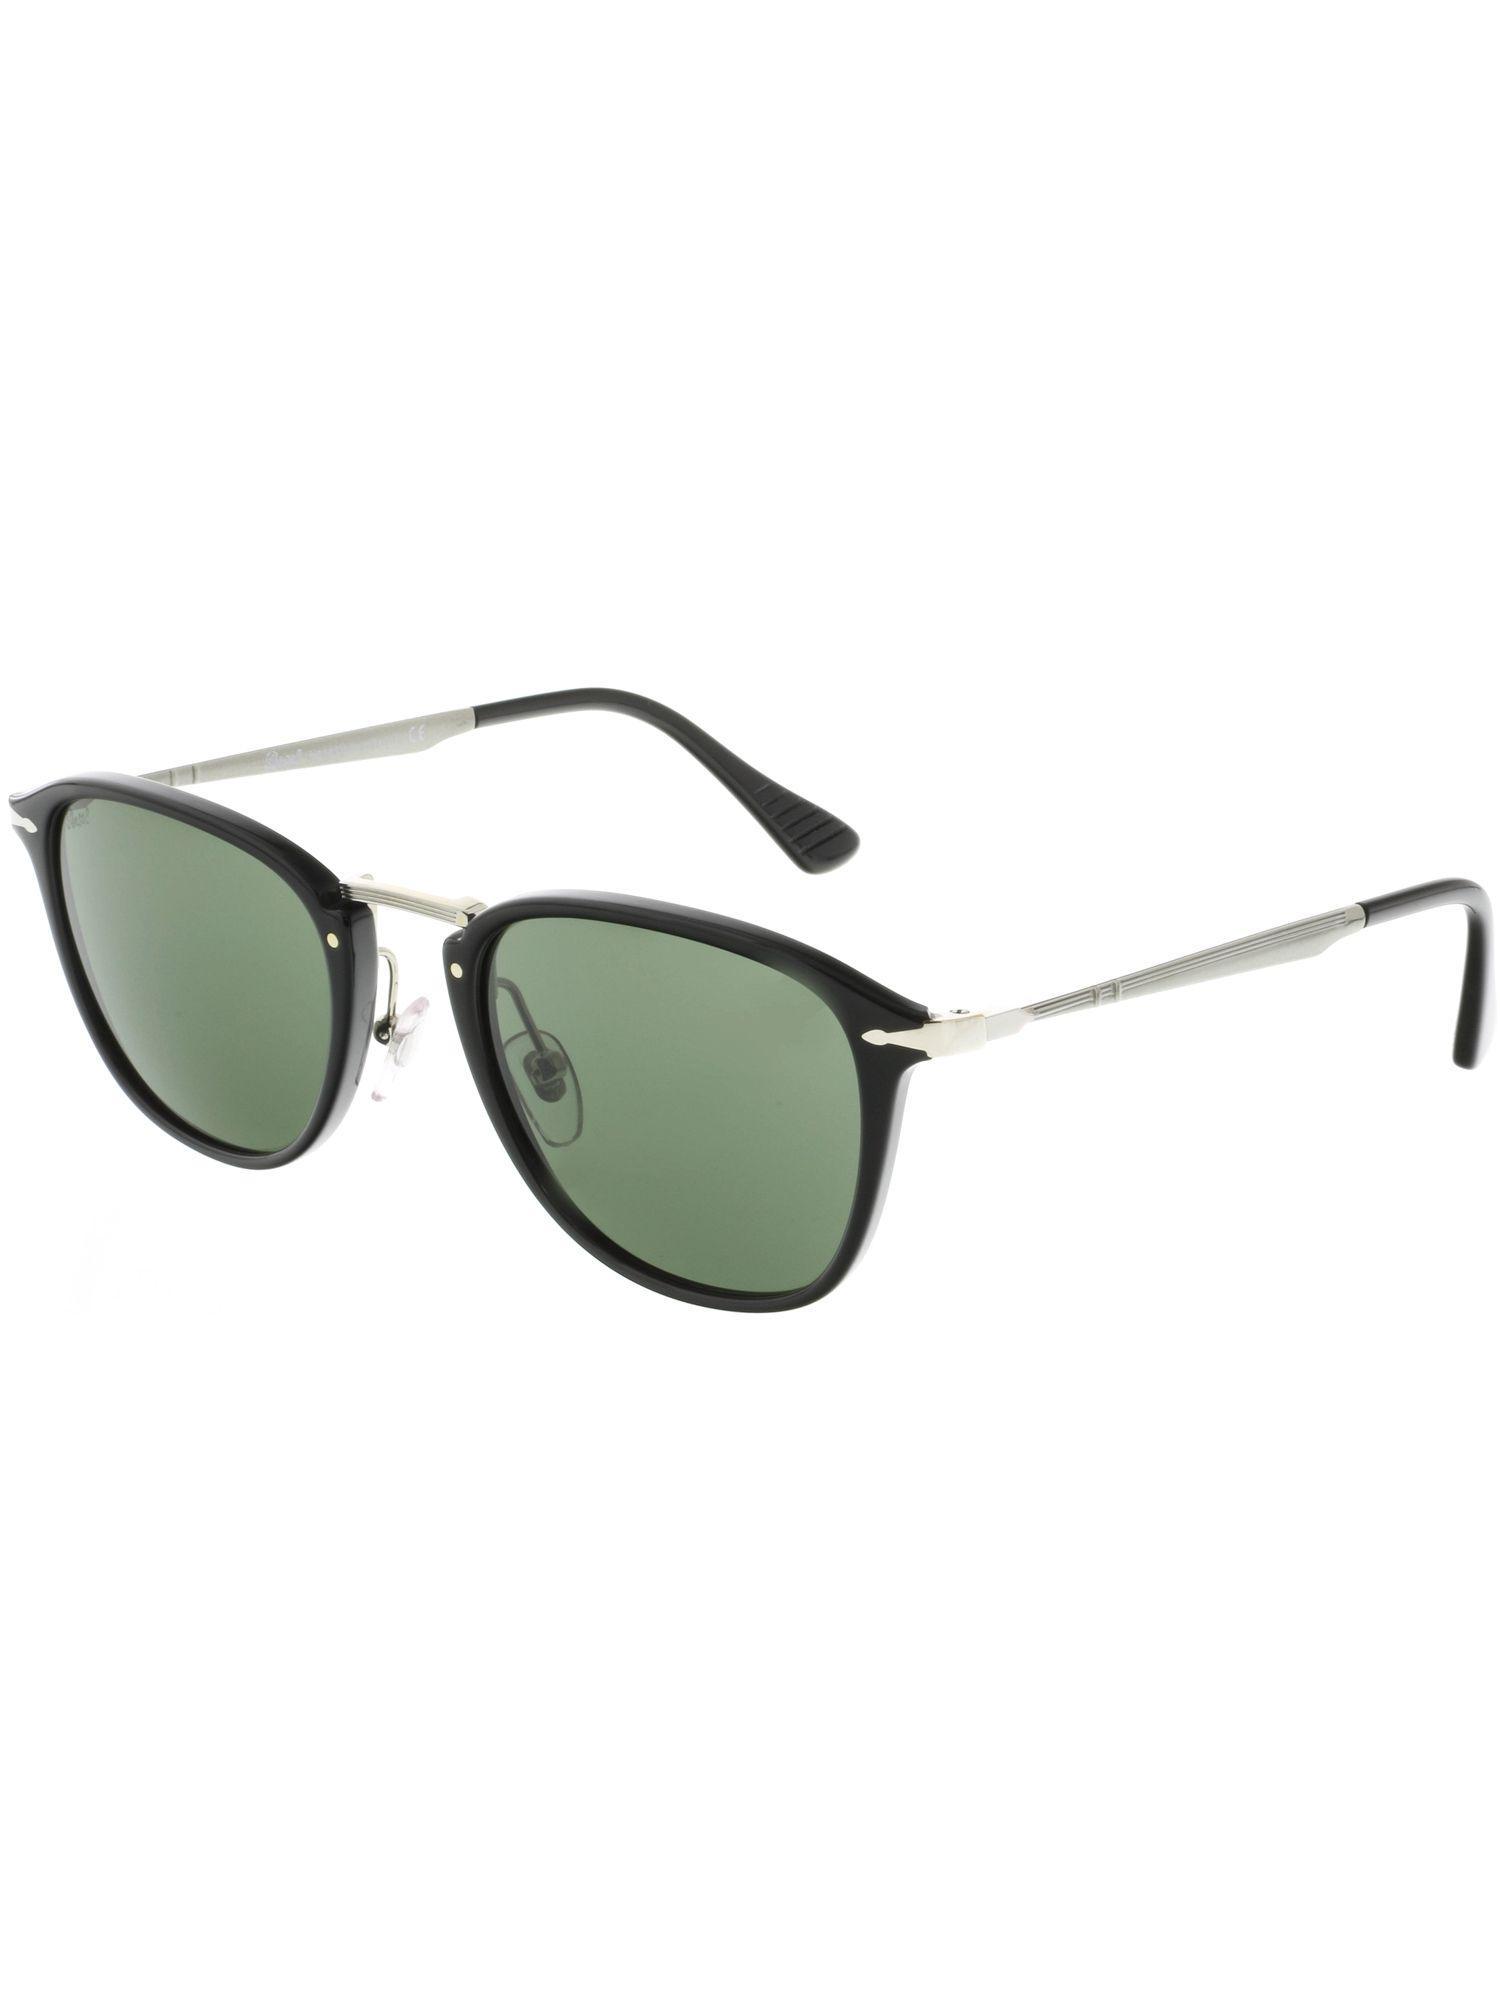 b5332ae4a3 Lyst - Persol Men s Po3165s-95 31-52 Black Rectangle Sunglasses for Men